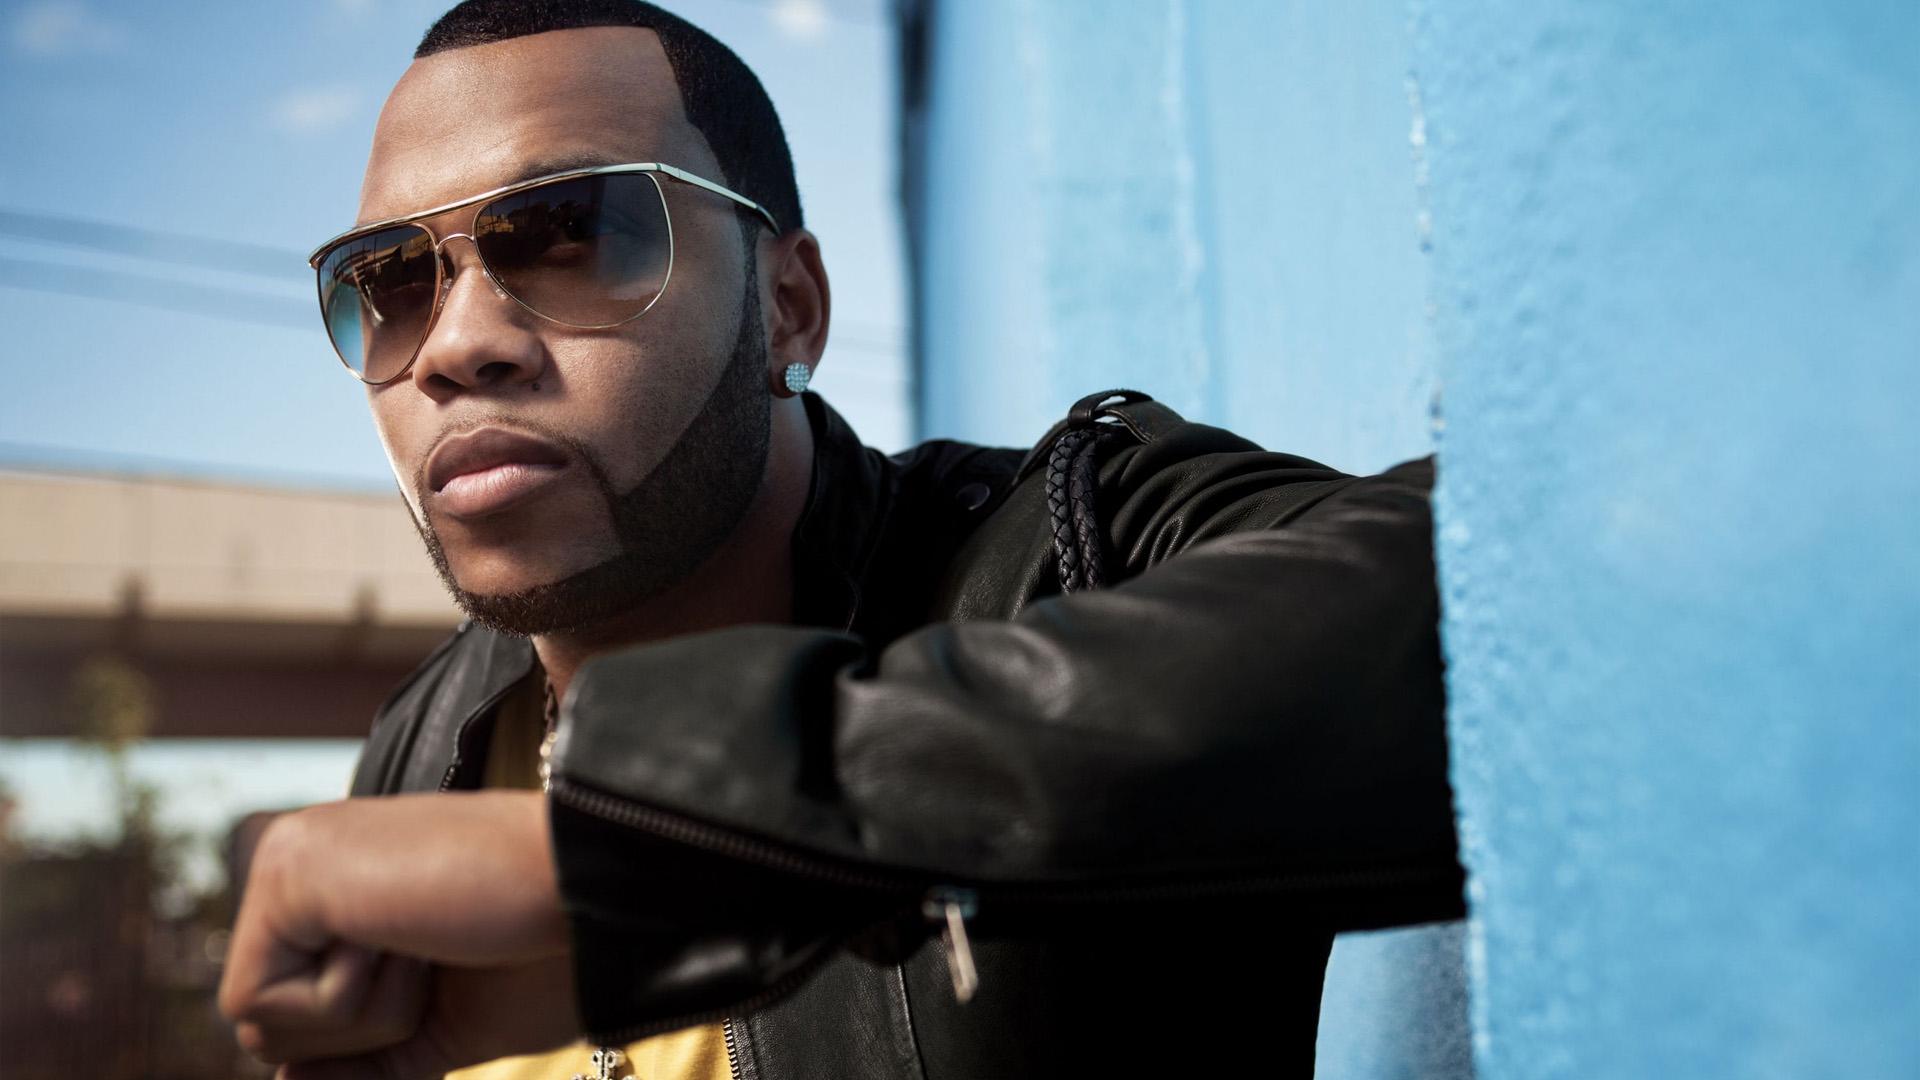 Flo Rida & Influence Hip Hop Has On Fashion